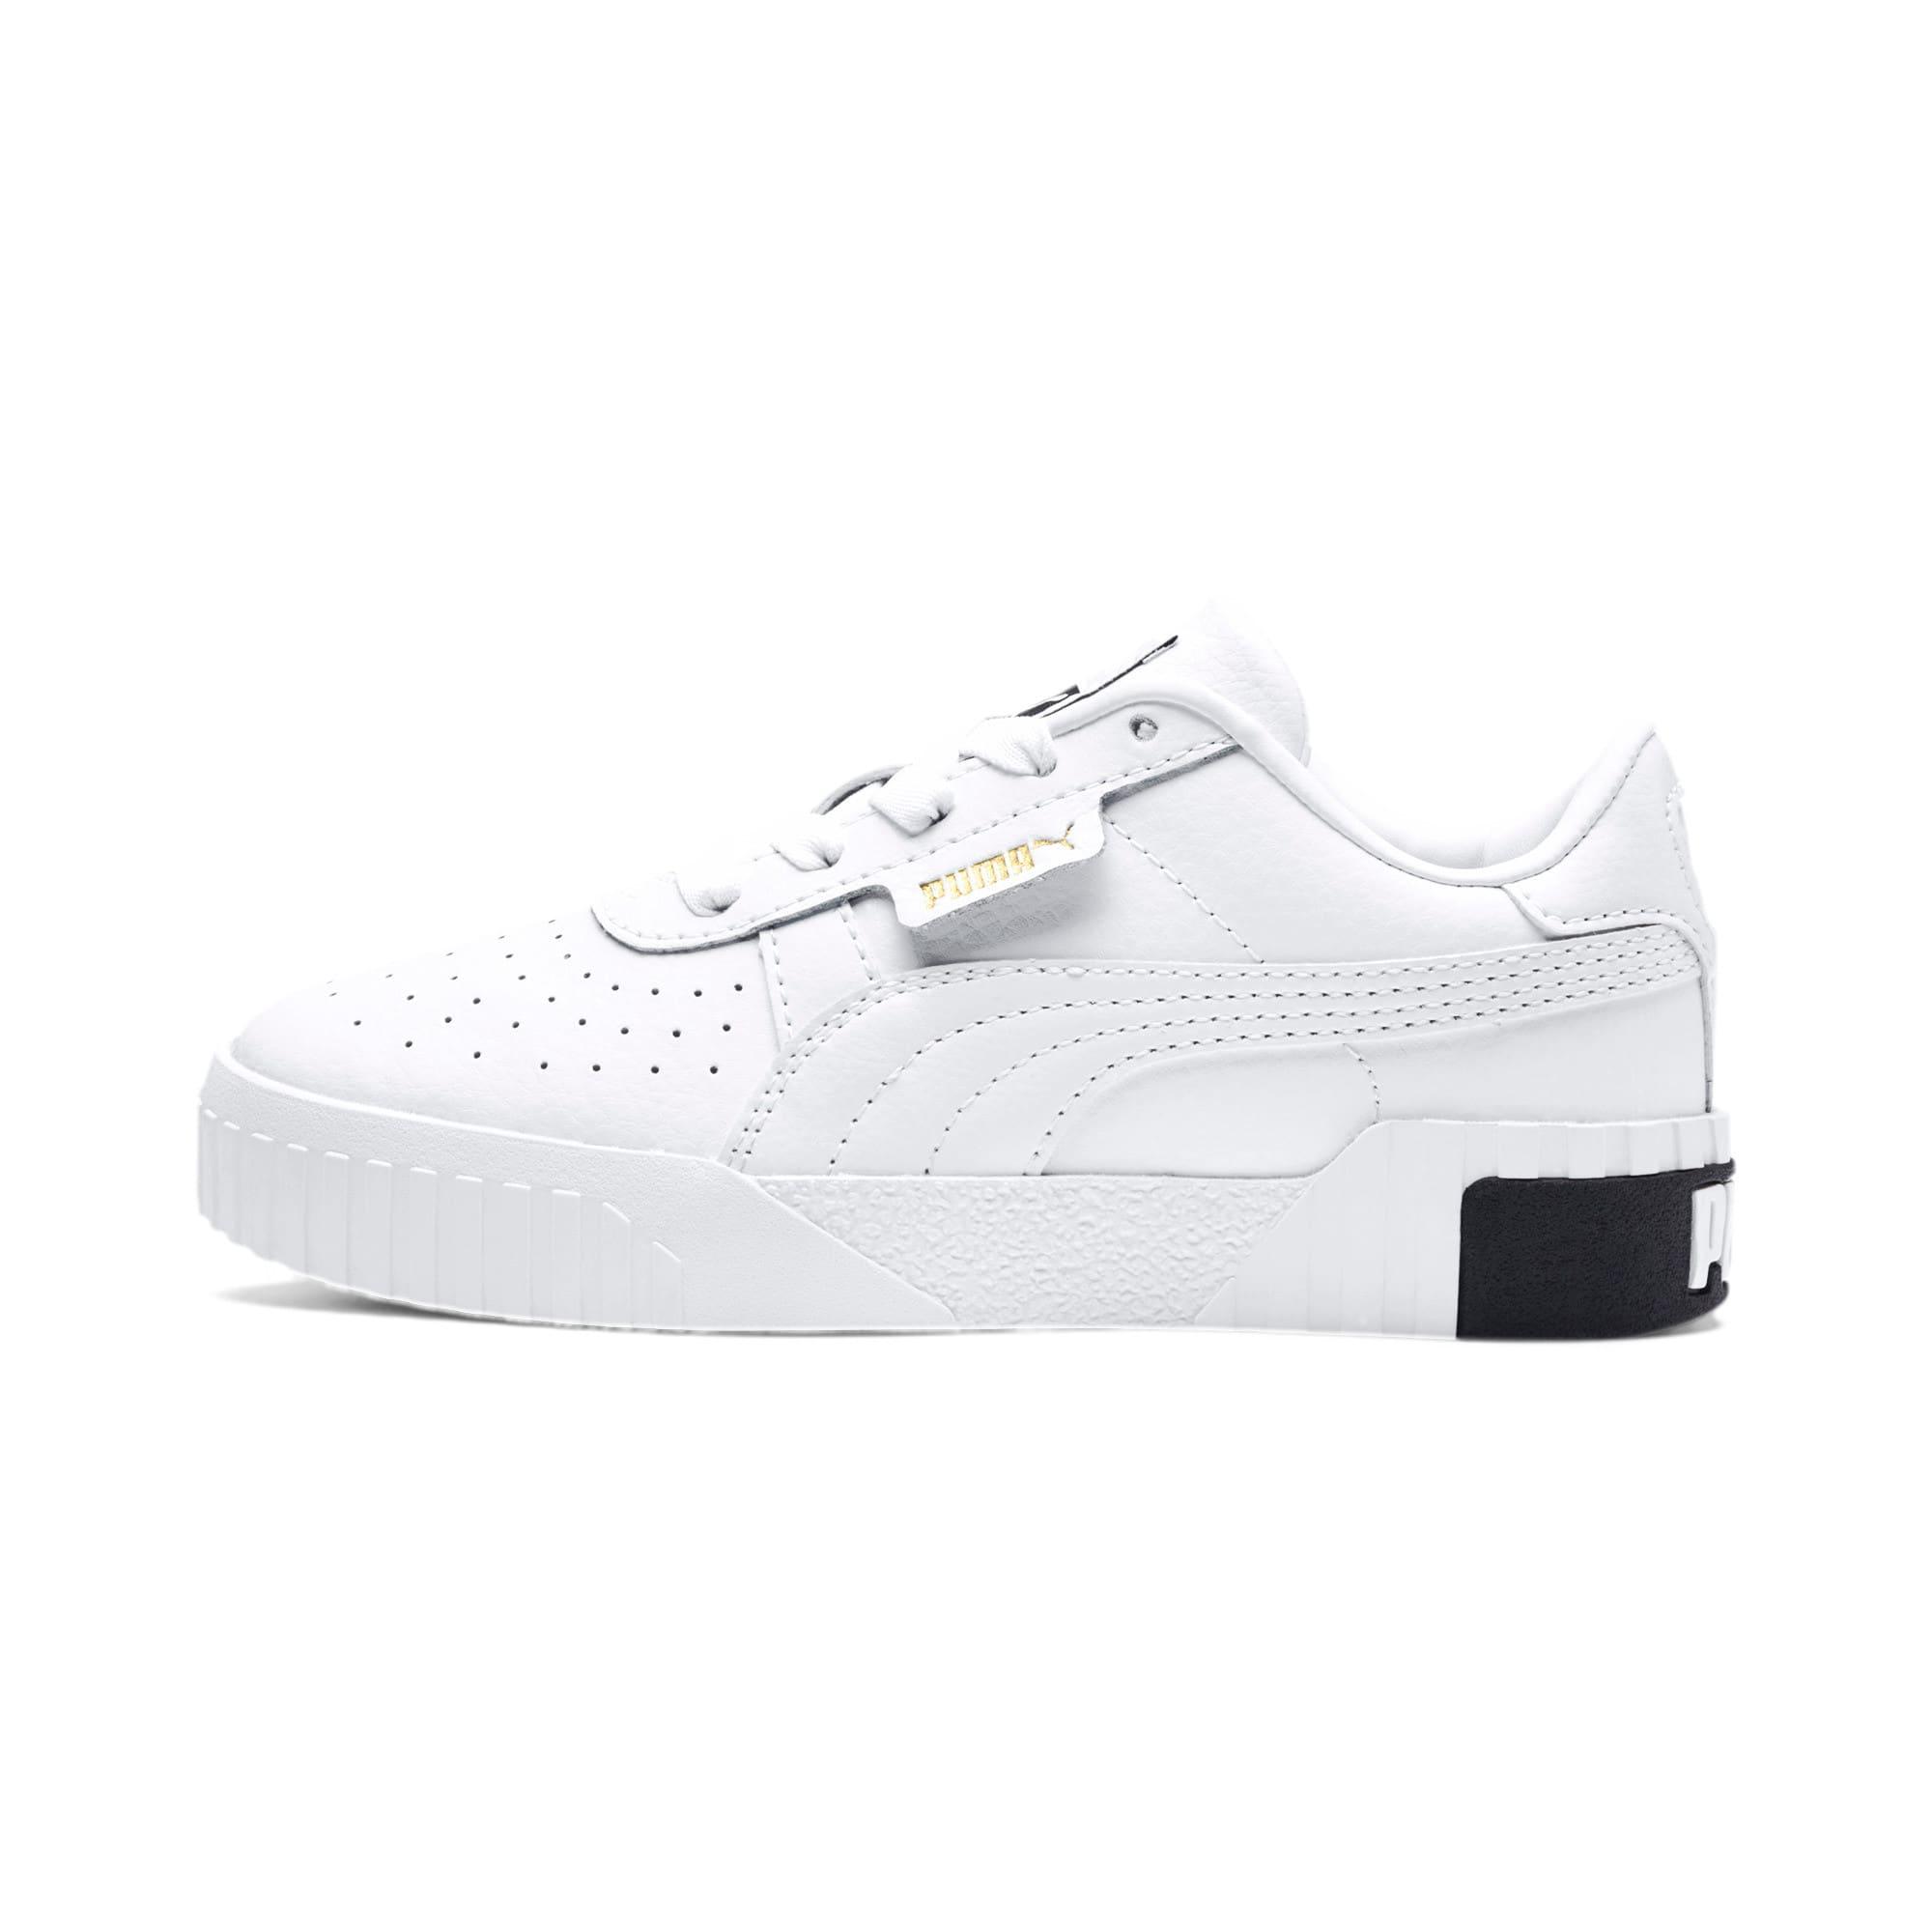 Thumbnail 1 of Cali Kids' Mädchen Sneaker, Puma White-Puma Black, medium